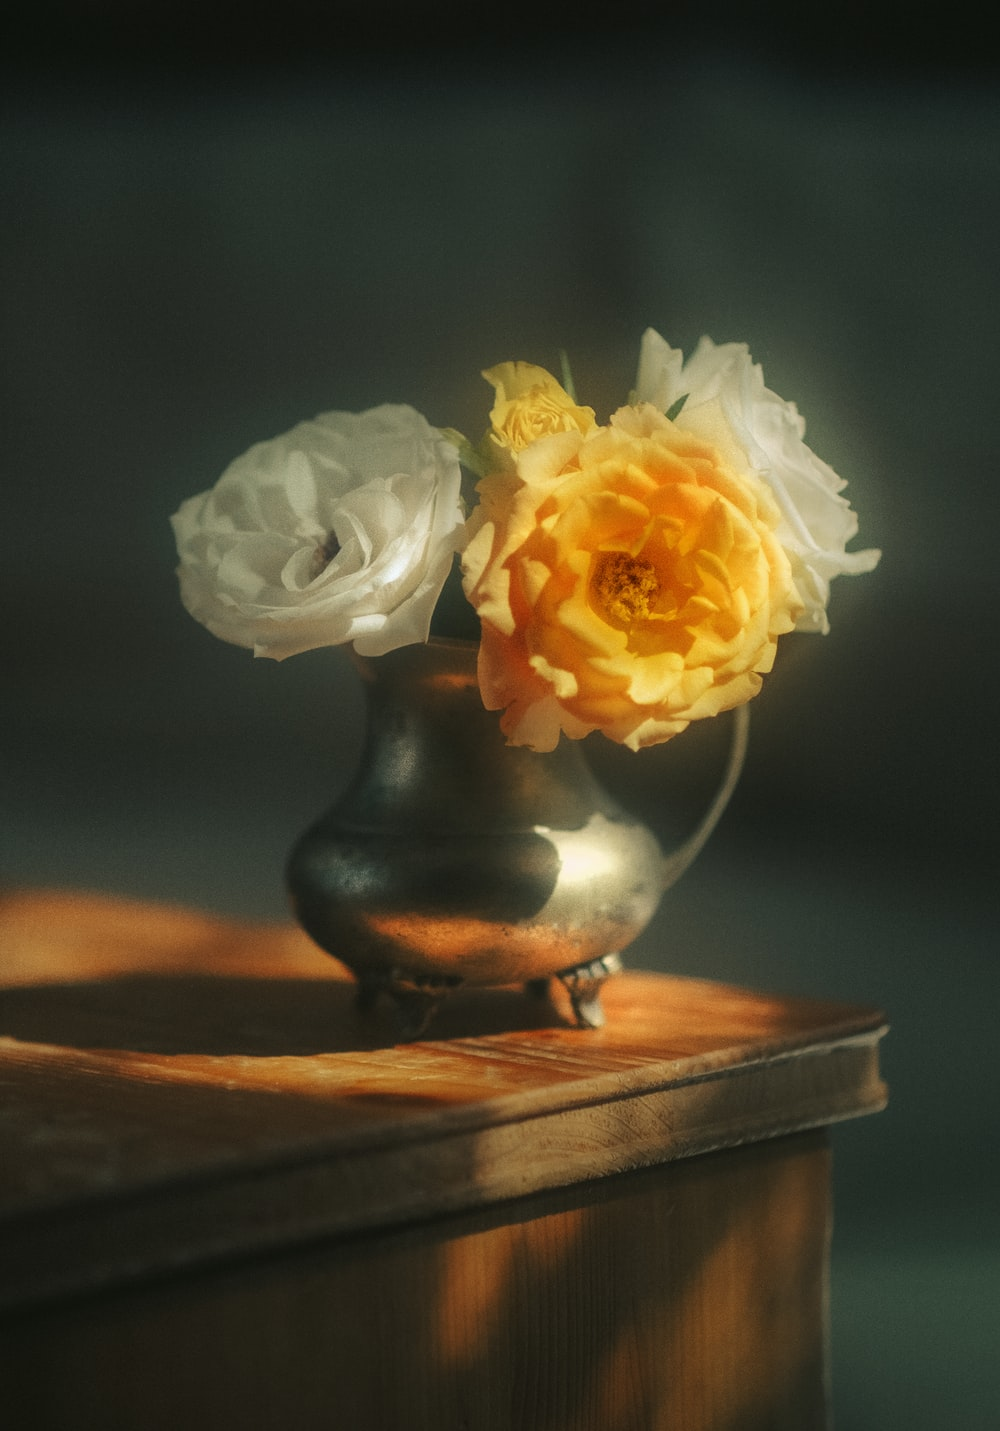 white and yellow flower on black ceramic vase